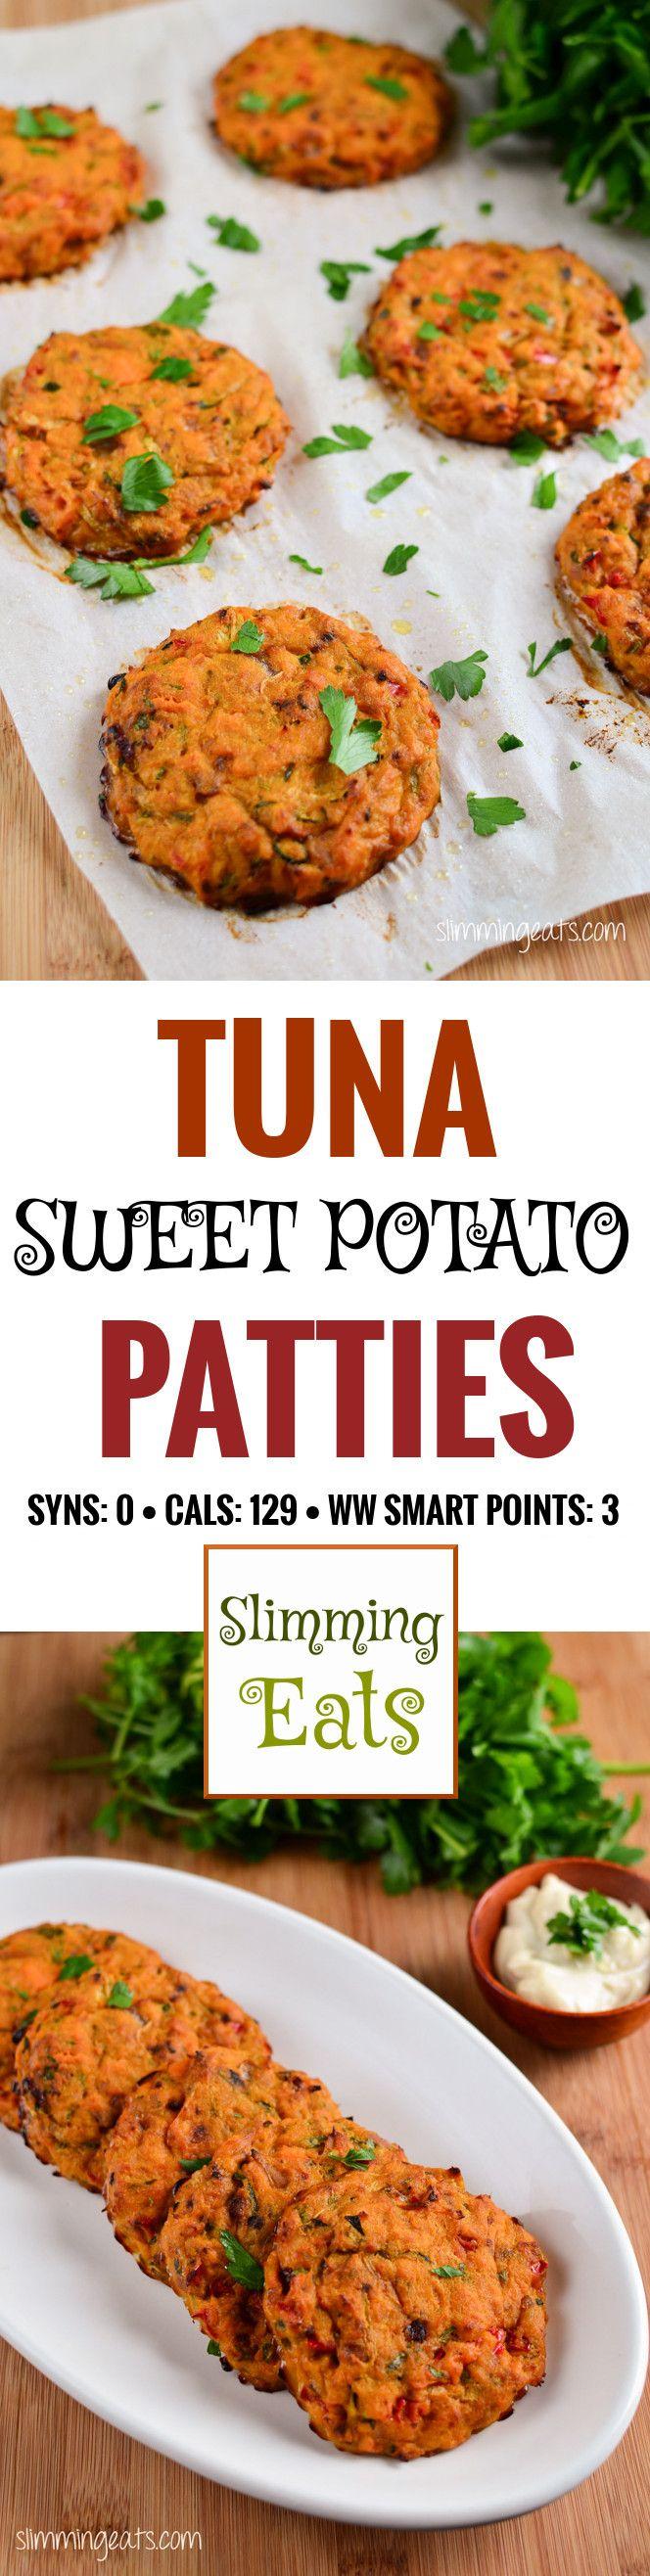 Slimming Eats Tuna and Sweet Potato Patties – gluten free, dairy free, whole30…